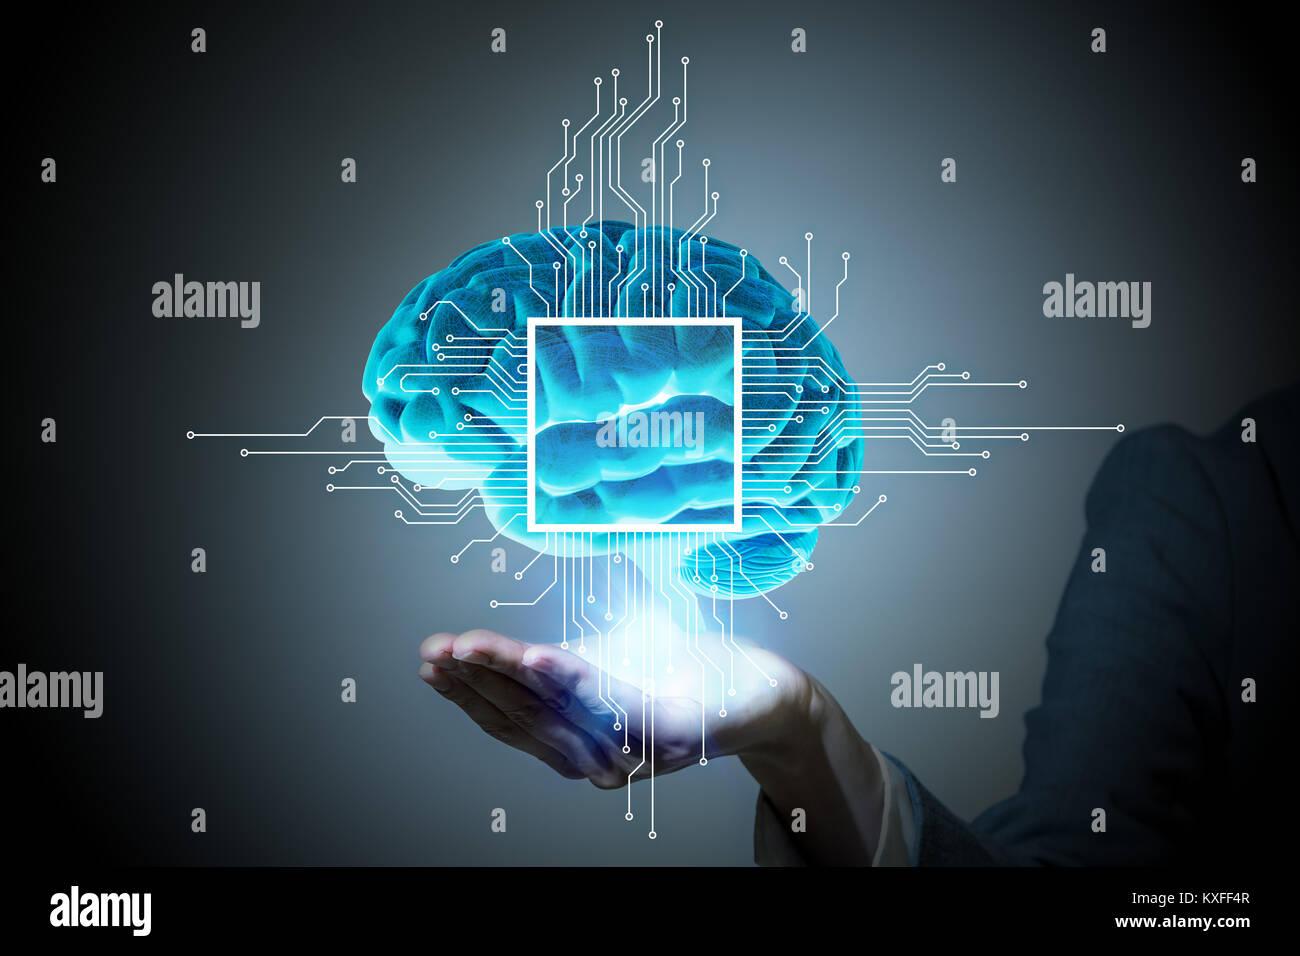 L'Intelligence Artificielle(IA) concept, rendu 3D, image abstraite Visual Photo Stock